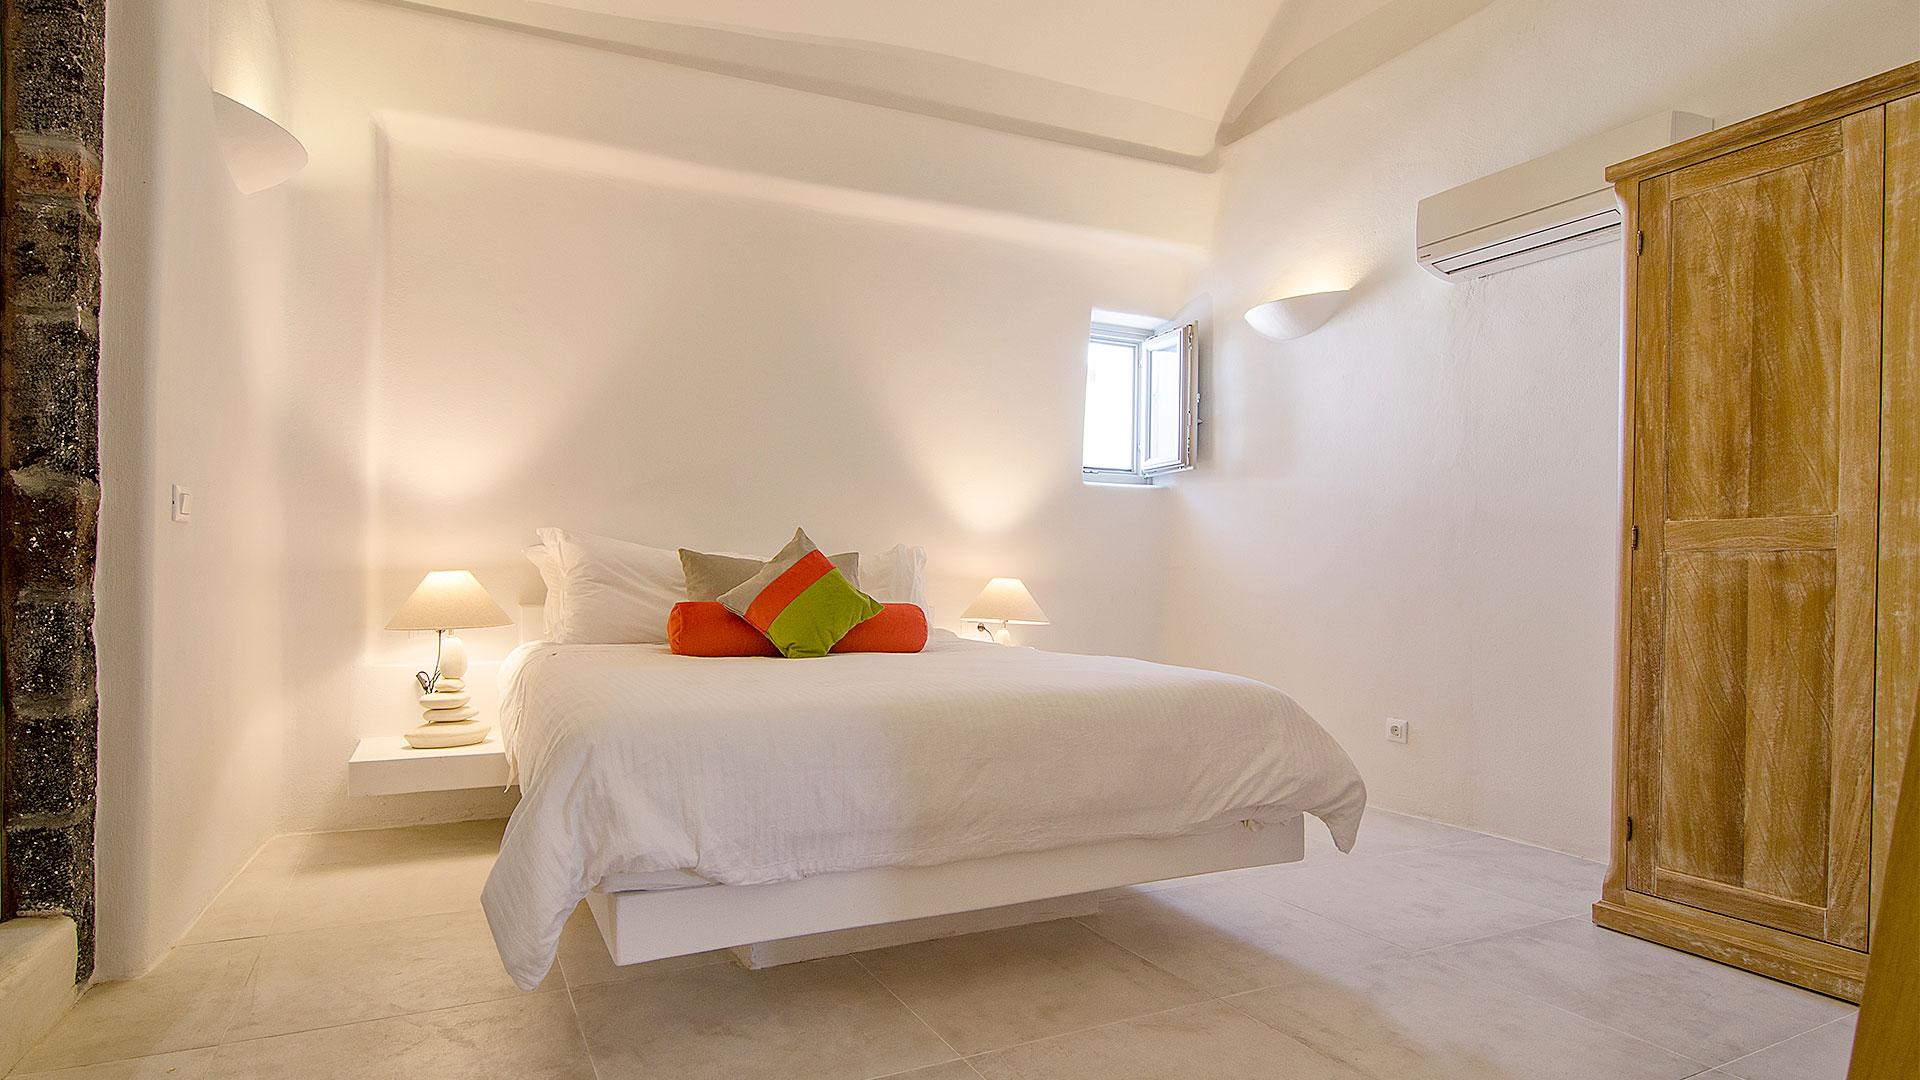 Santorini jacuzzi suites | Pura Vida | Bedroom